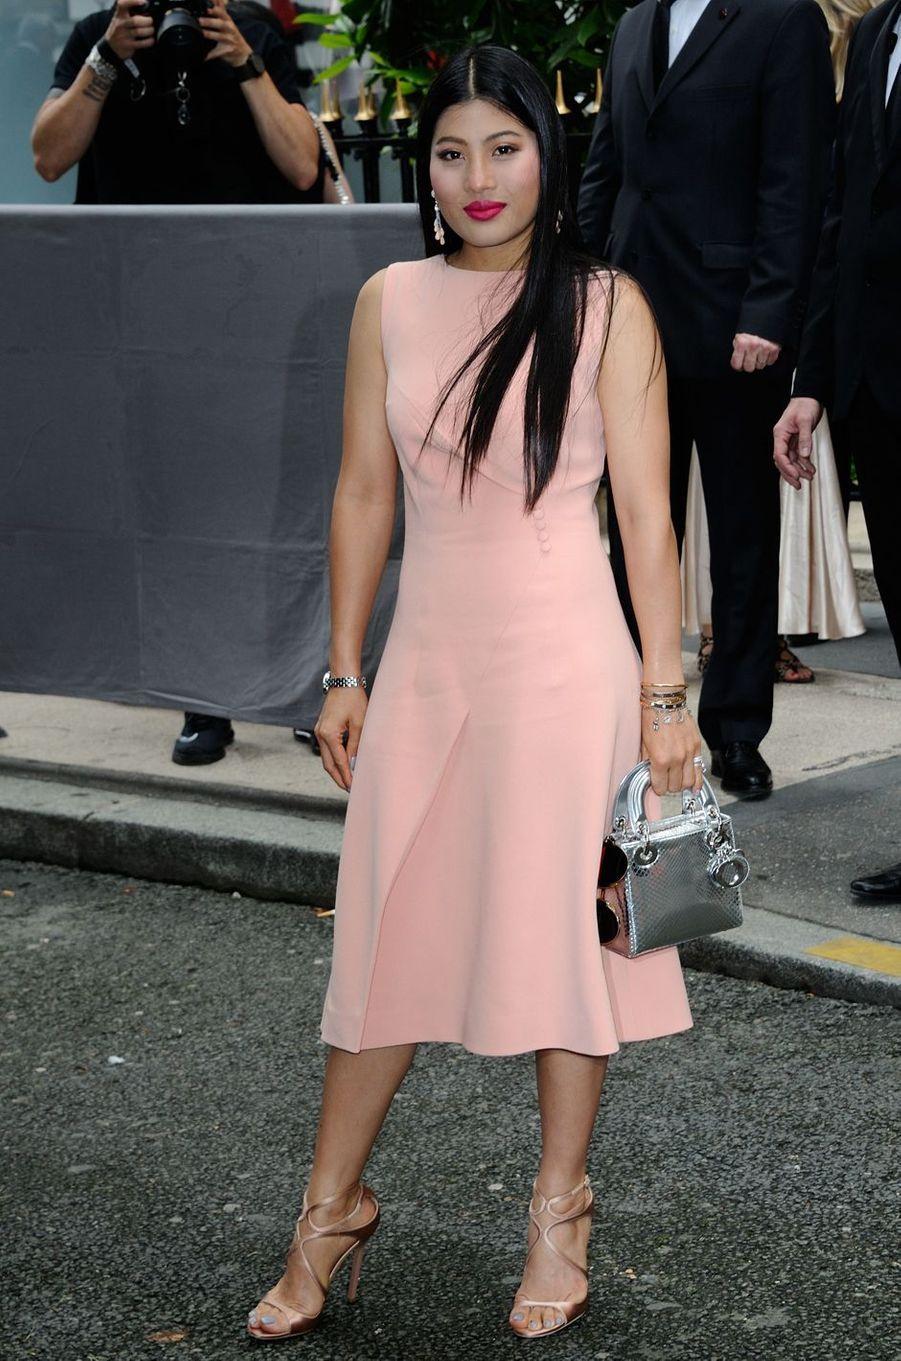 La princesse Sirivannavari Nariratana de Thaïlande à Paris, le 4 juillet 2016